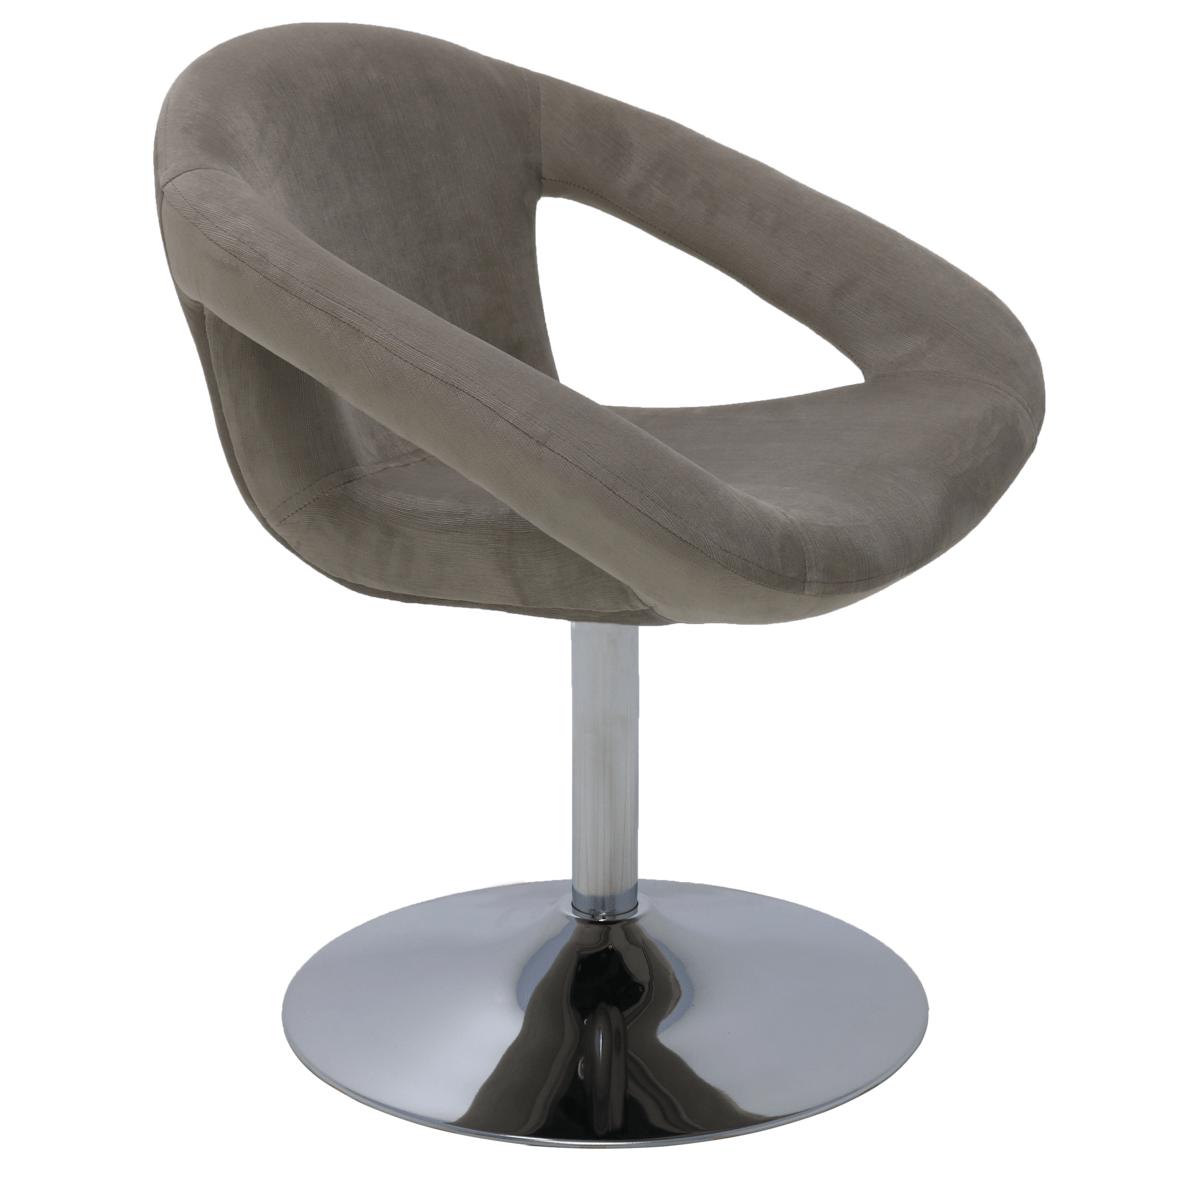 Cadeira Tramontina Delice Estofada Cinza em Polietileno com Base Central 92706211